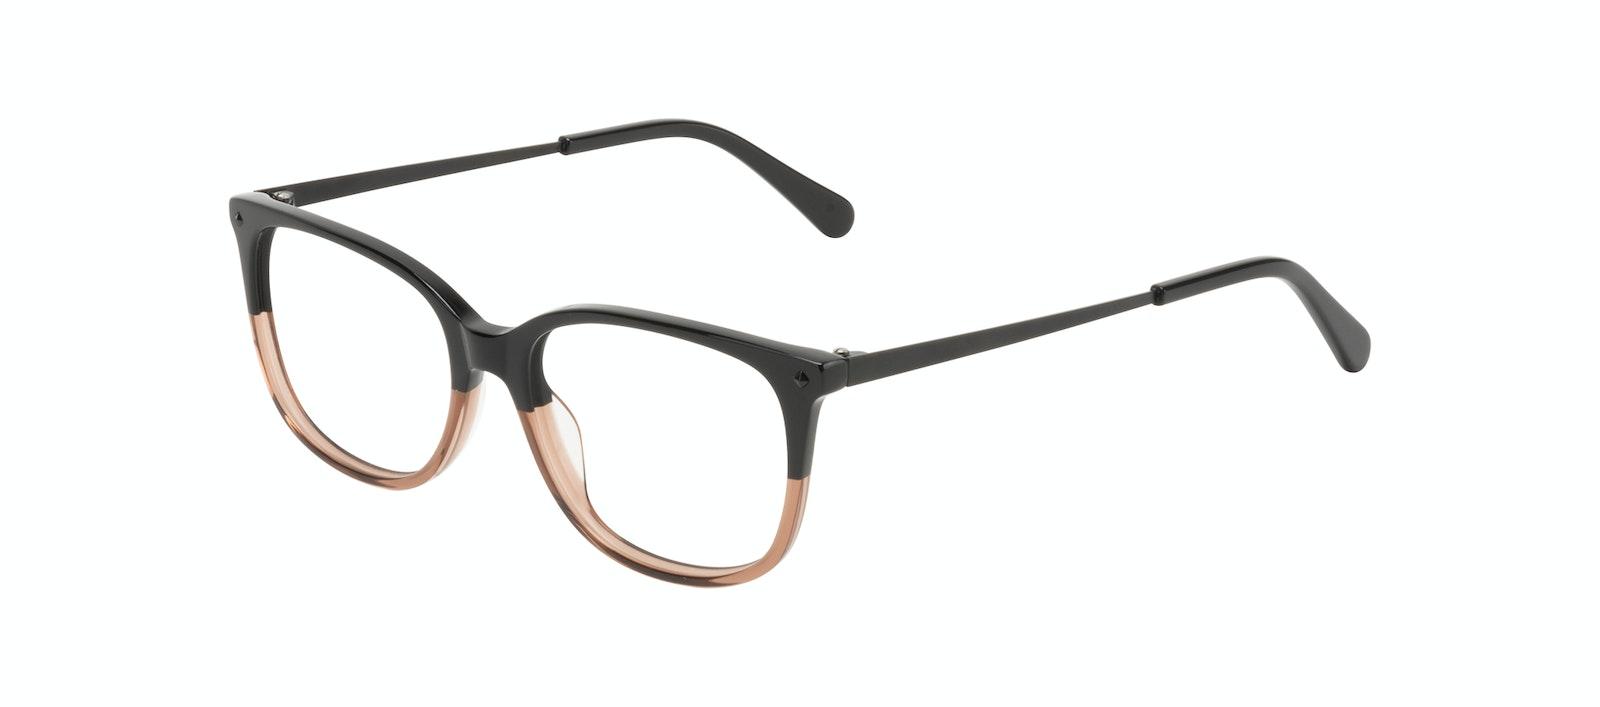 Affordable Fashion Glasses Rectangle Square Eyeglasses Women Refine Wood Terra Tilt